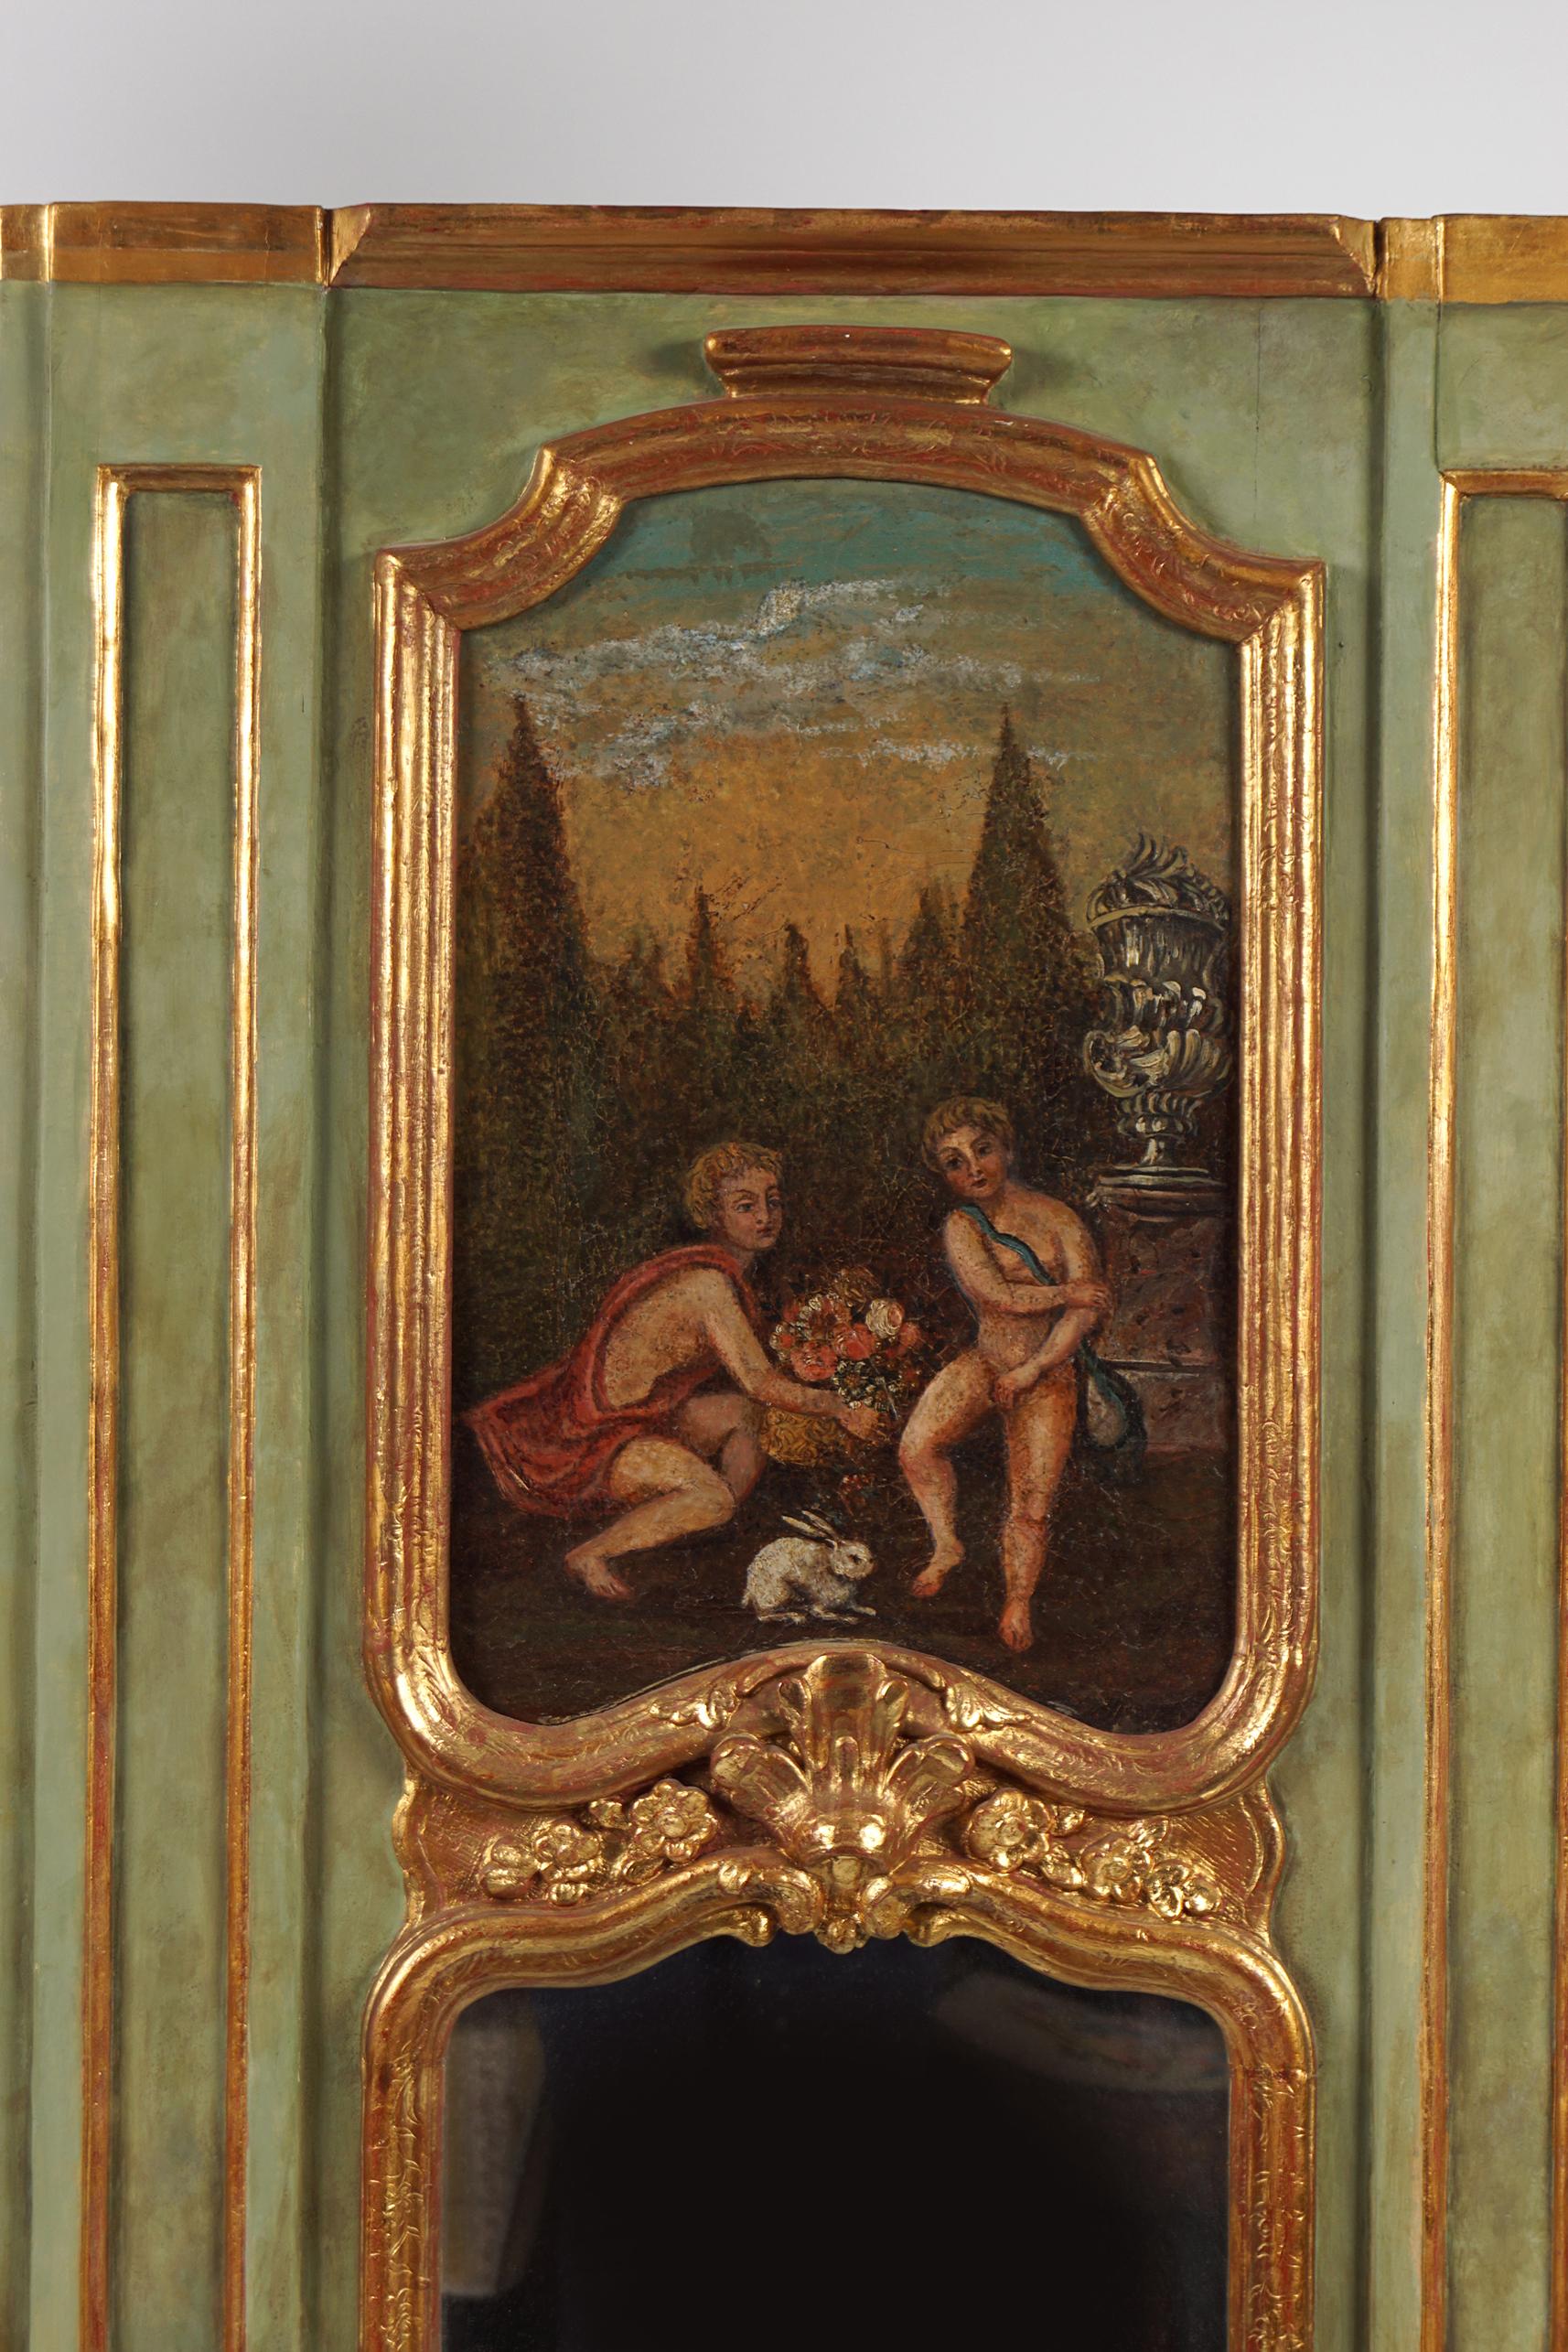 19TH-CENTURY PARCEL-GILT TRUMEAU MIRROR - Image 2 of 2